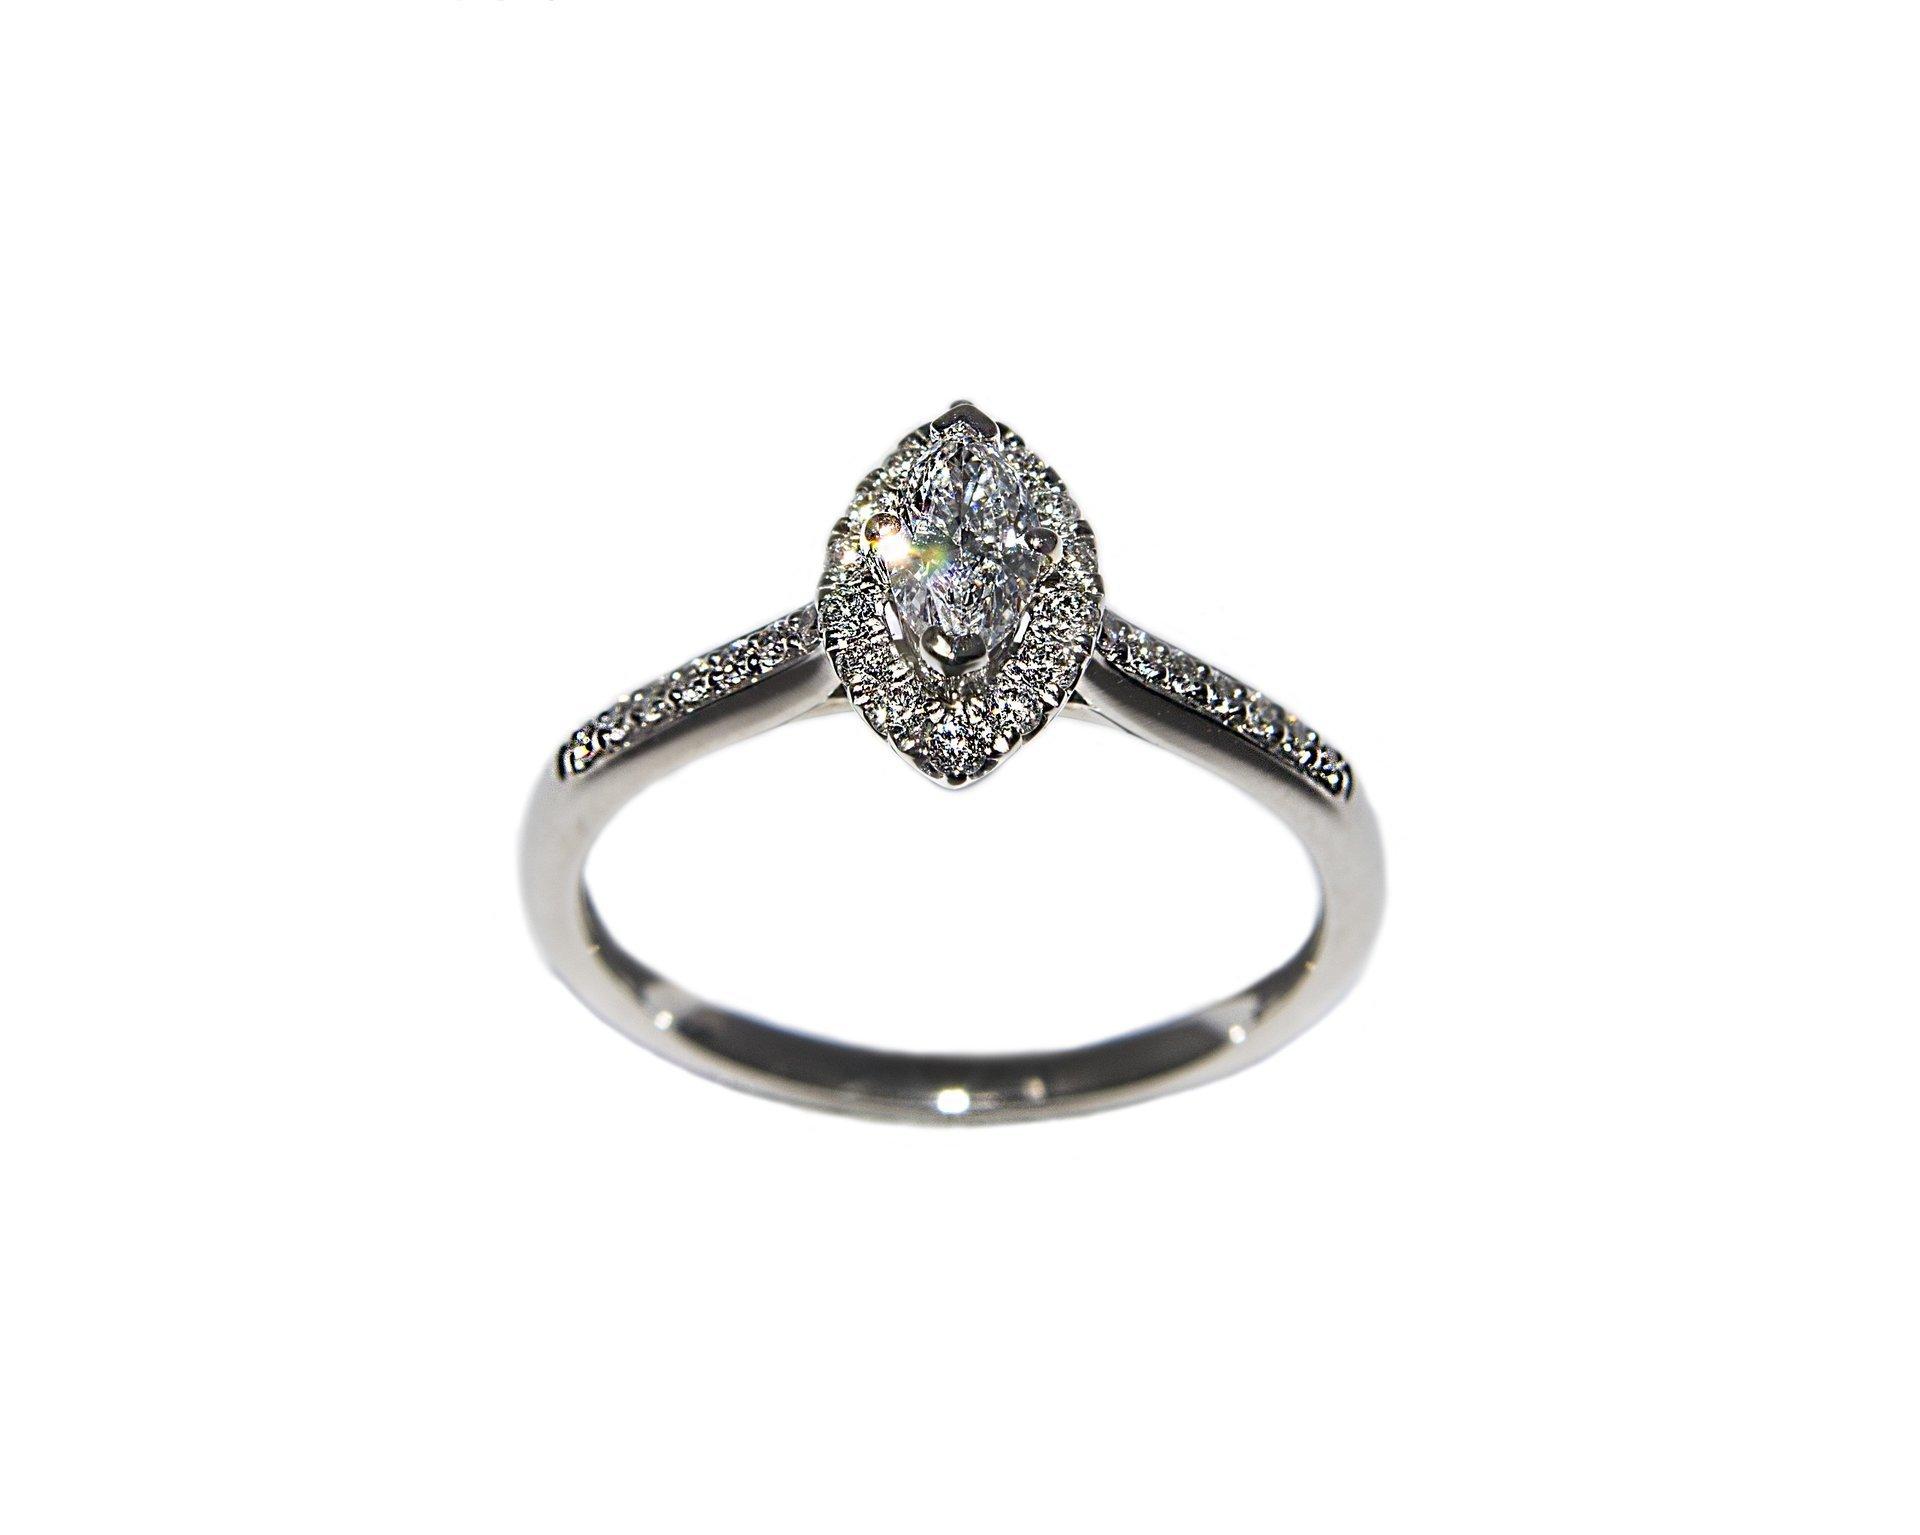 Platinum, Halo Set, Marquise Cut Diamond